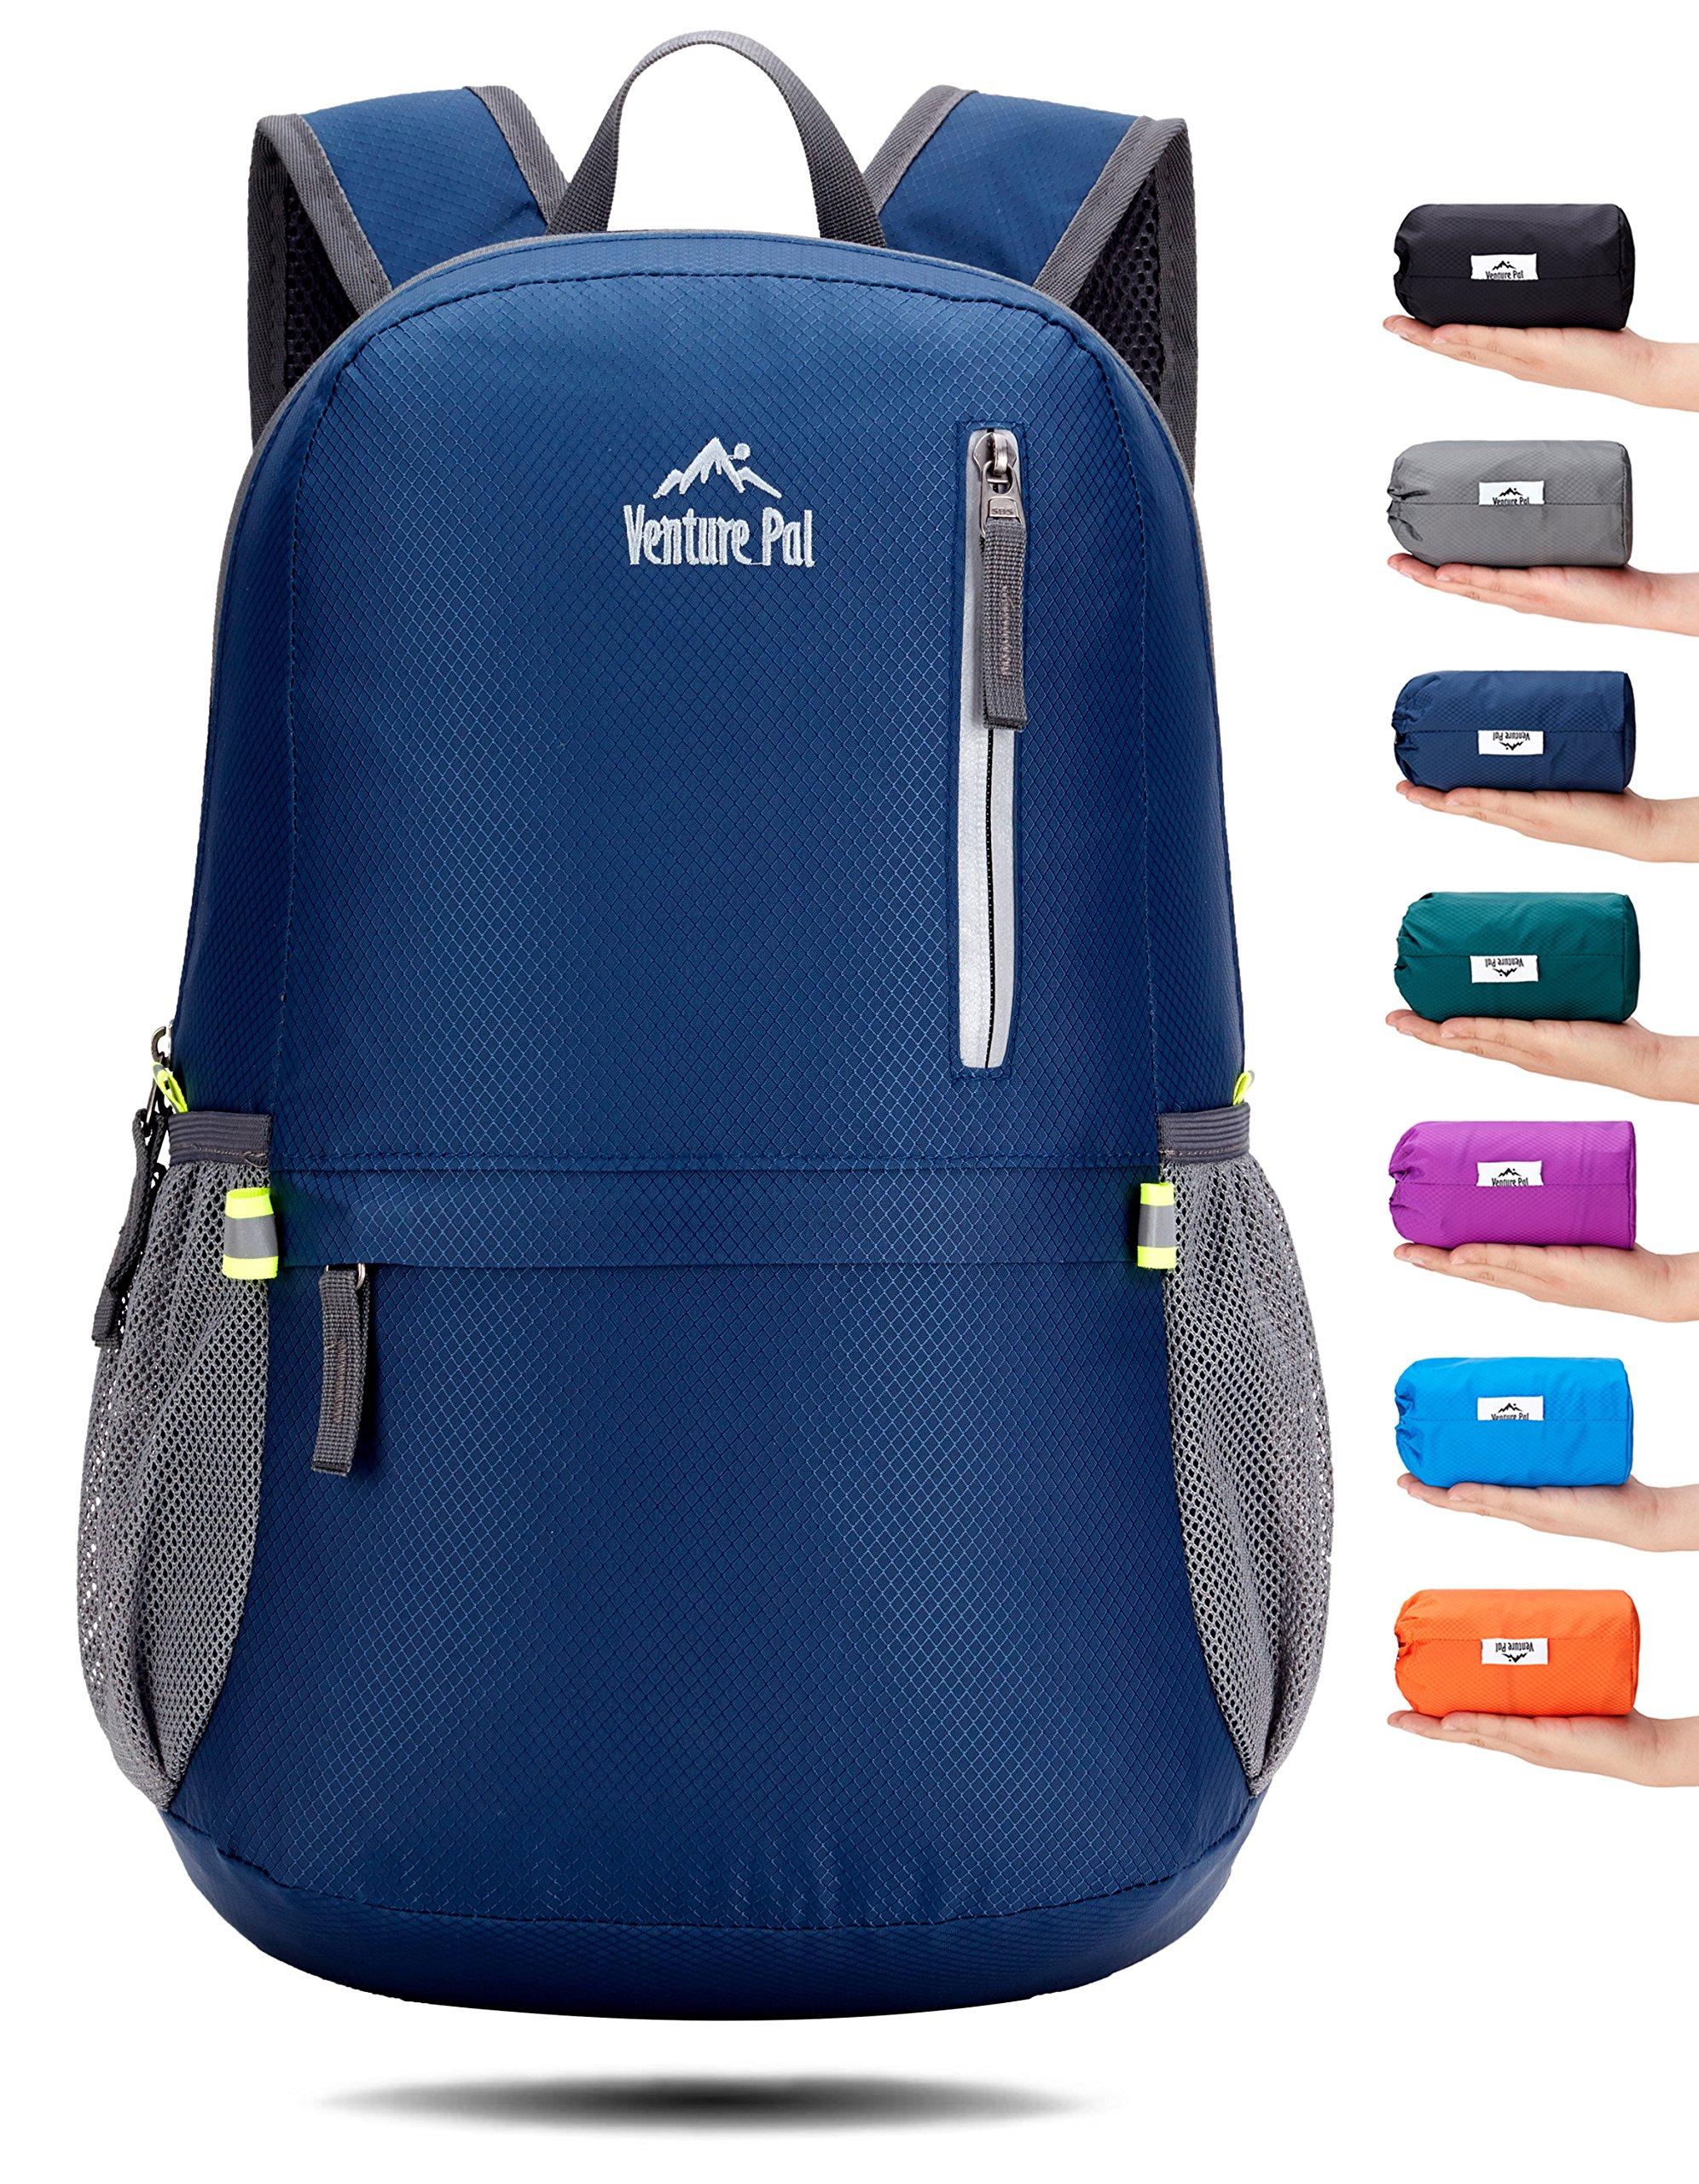 Venture Pal 25L Travel Backpack - Durable Packable Lightweight Small Backpack Women Men (Navy)